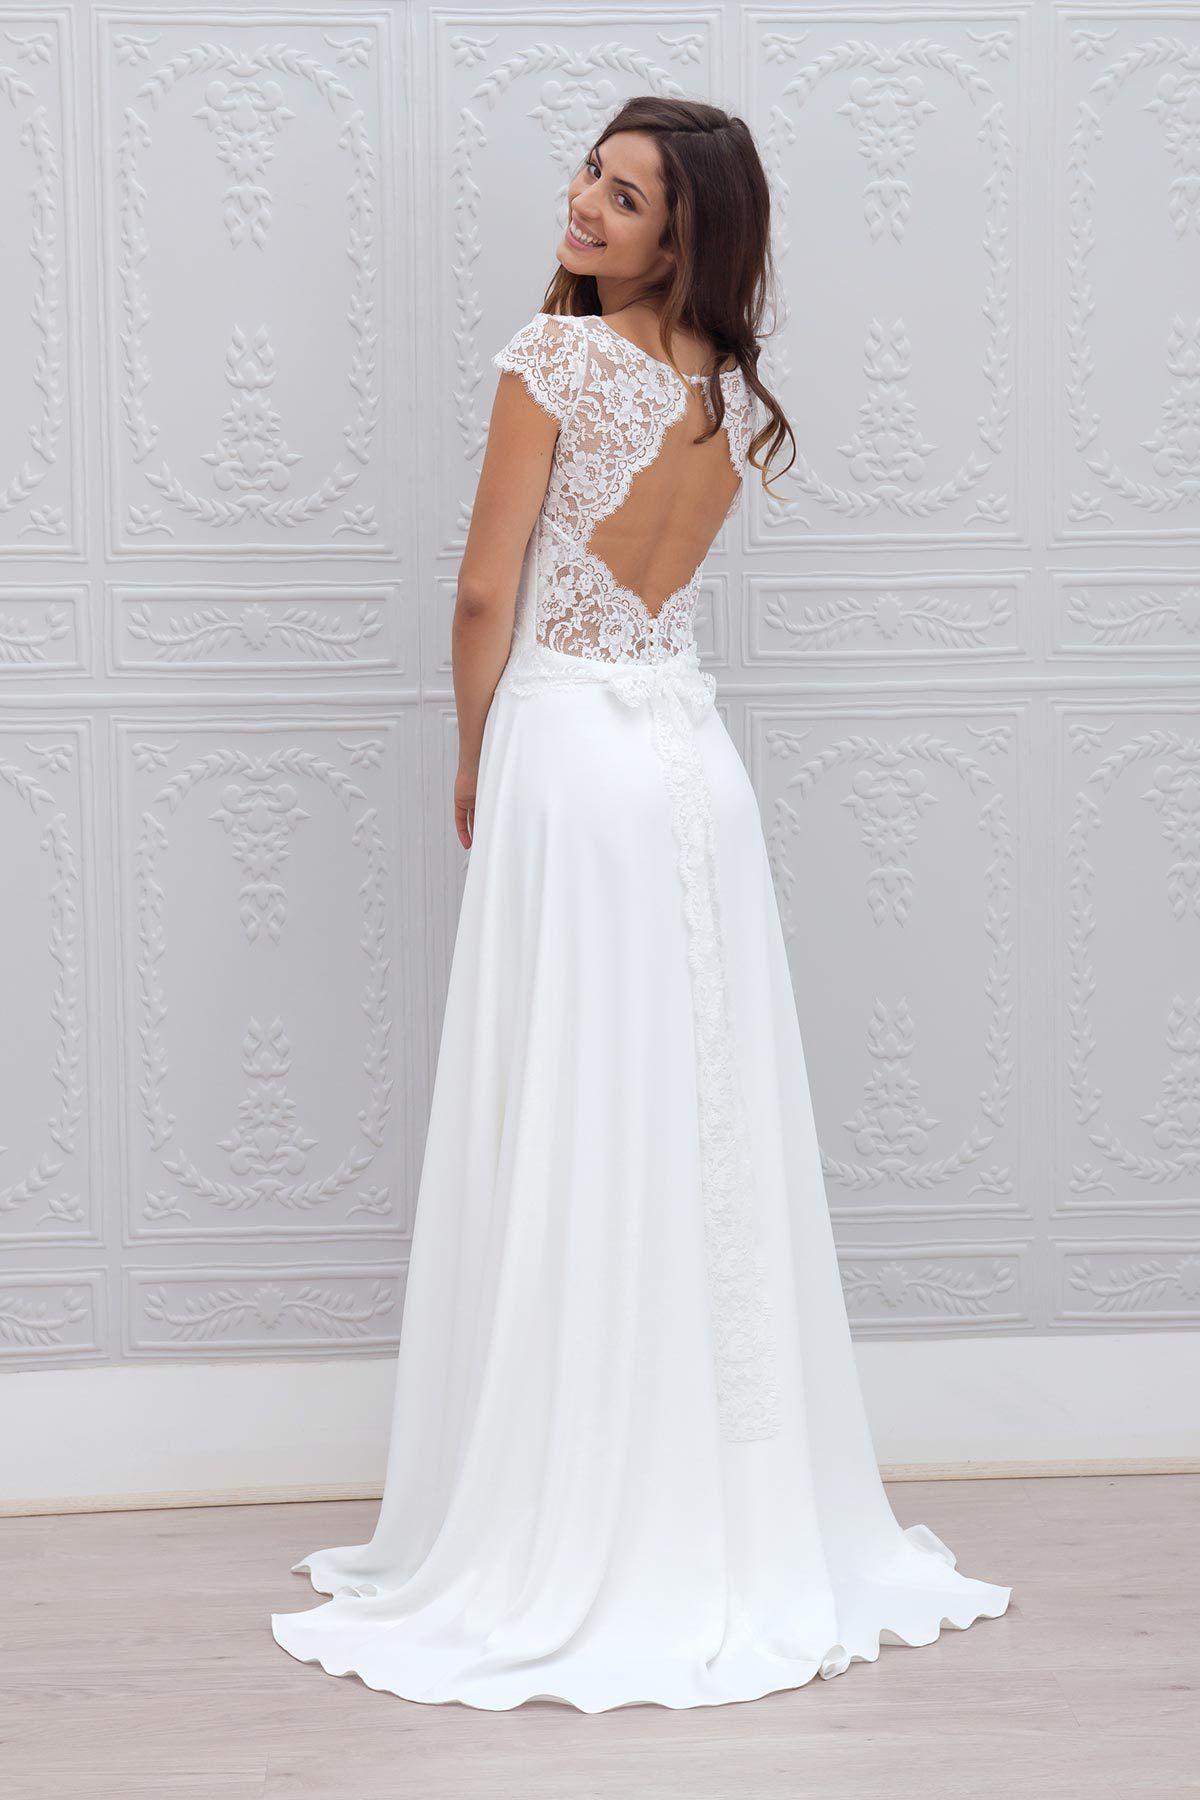 Marie Laporte Robes de mariée - Wedding dresses -   Hochzeitskleider ...